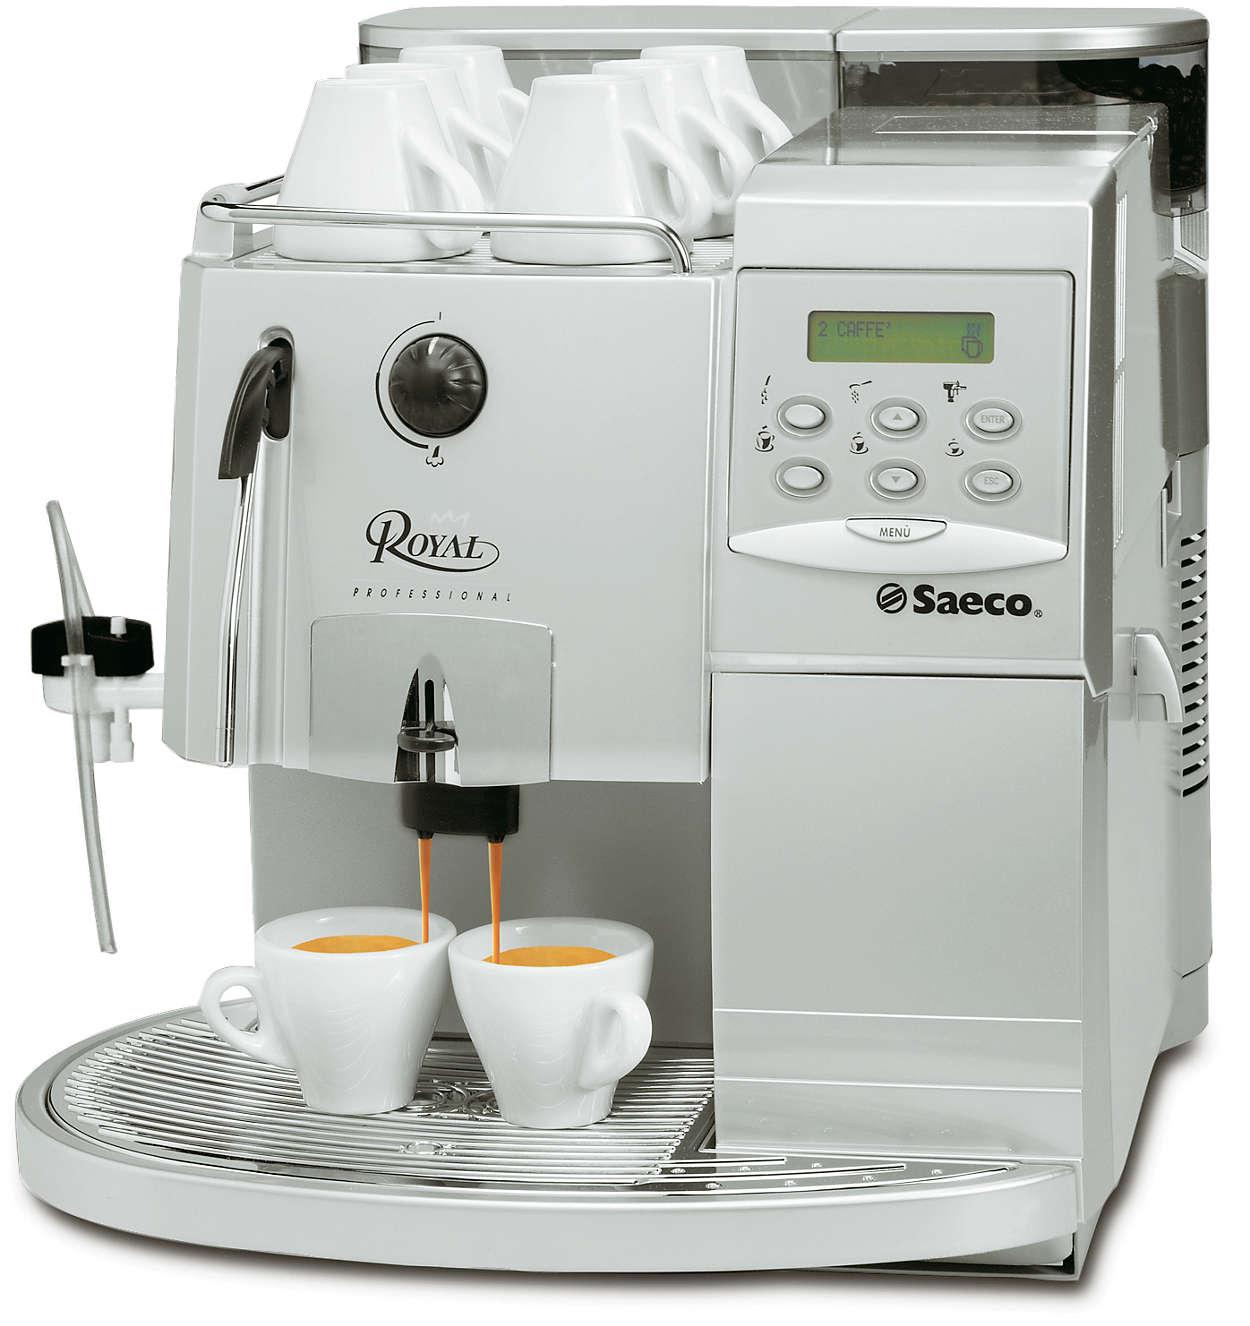 royal super automatic espresso machine ri9913 47 saeco. Black Bedroom Furniture Sets. Home Design Ideas